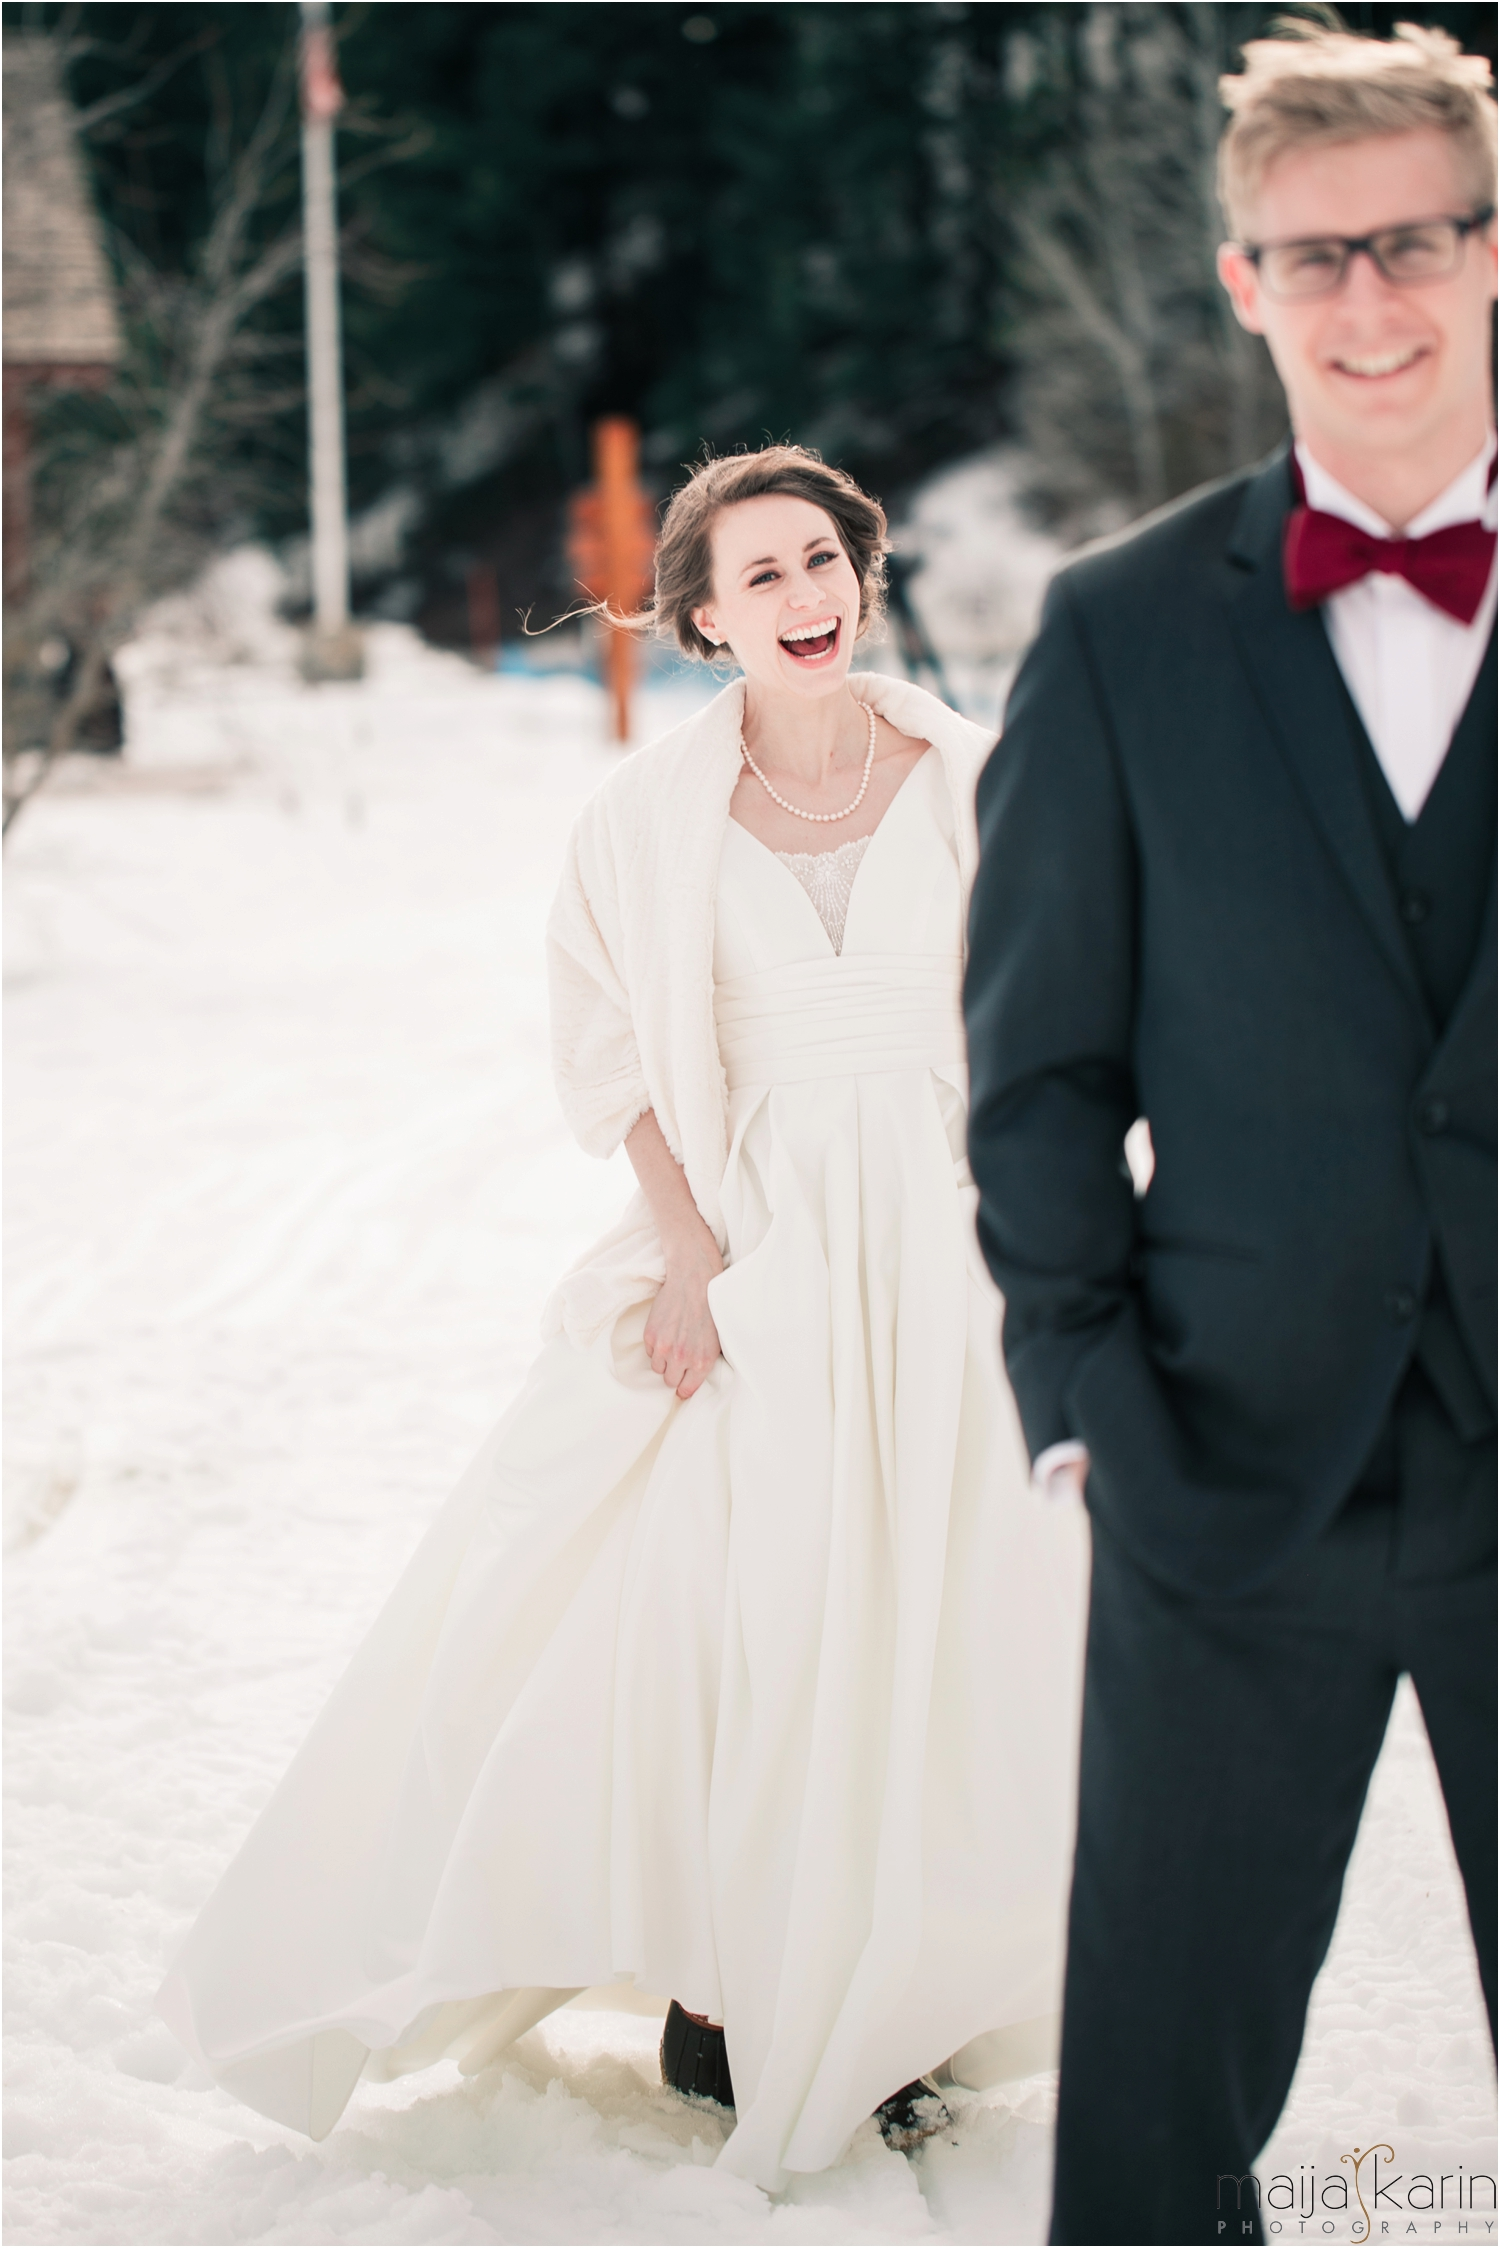 Mountain-Springs-Lodge-wedding-maija-karin-photography_0034.jpg